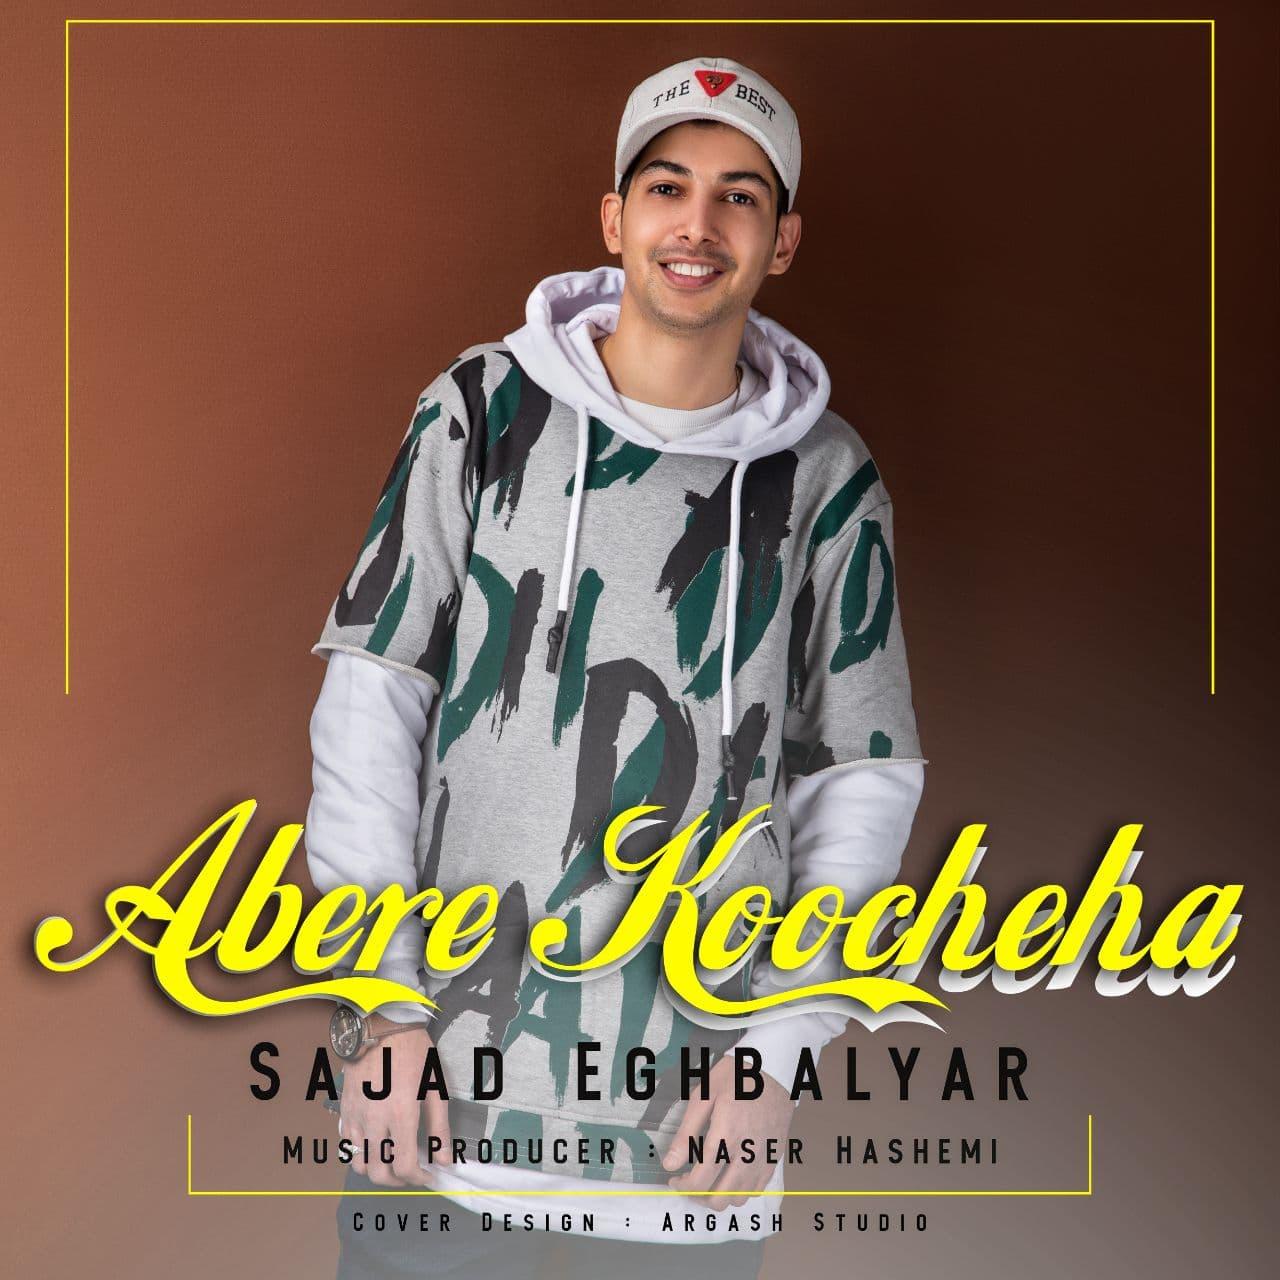 Sajad Eghbalyar – Abere Koocheha